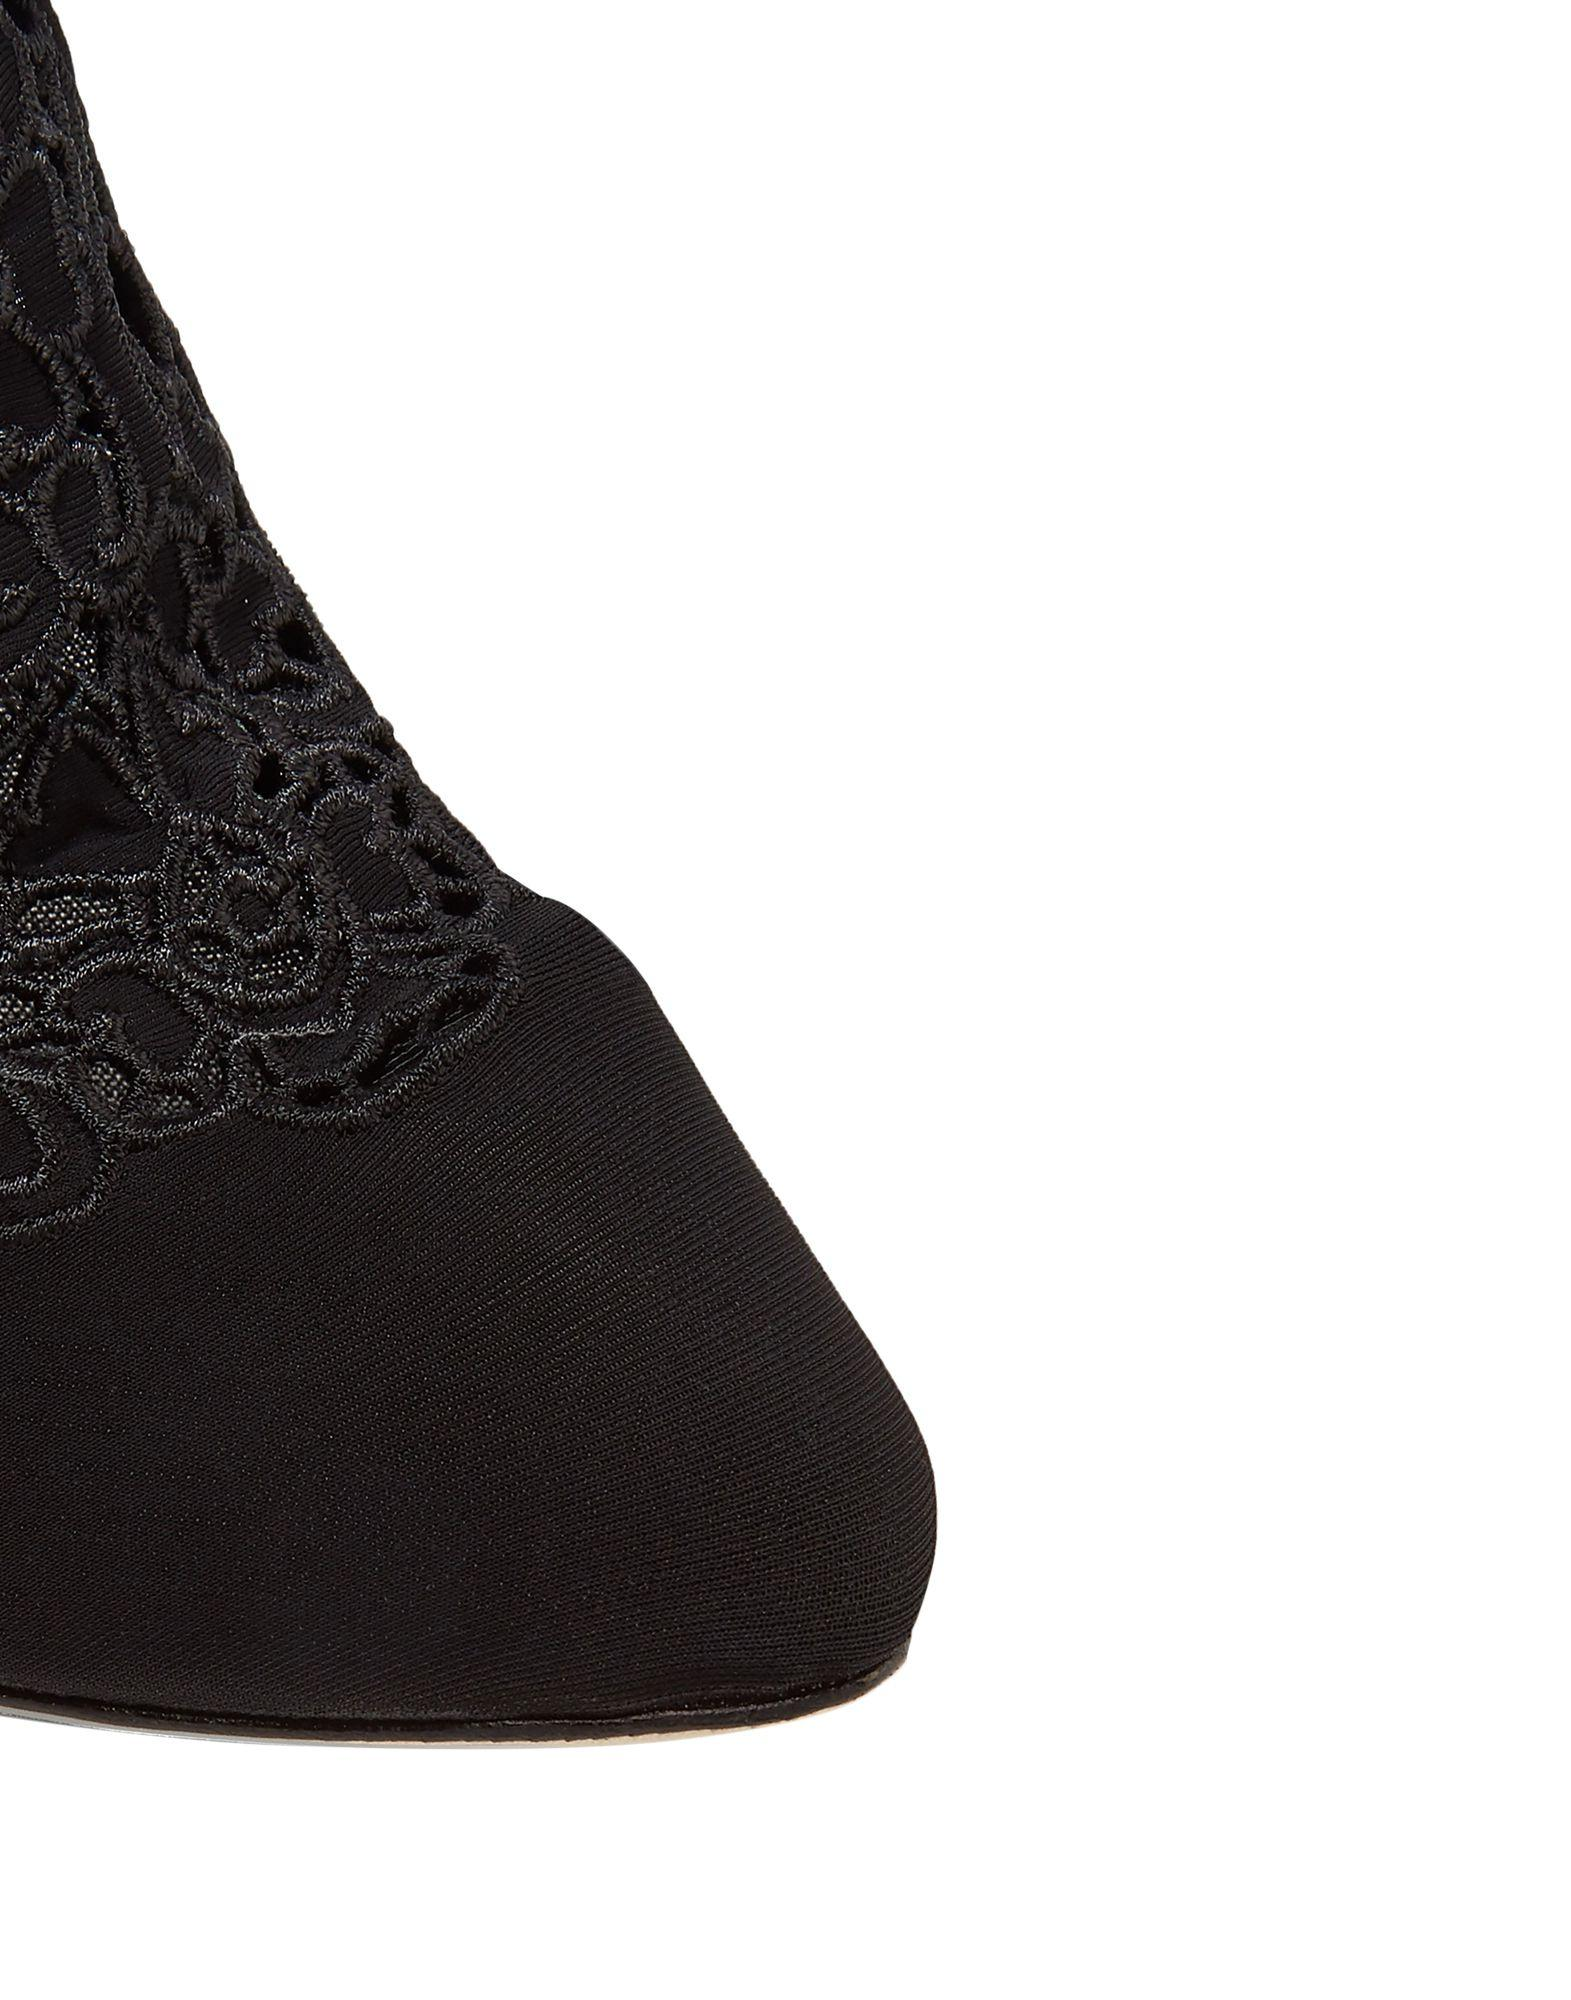 Botas Dolce & Gabbana de Encaje de color Negro